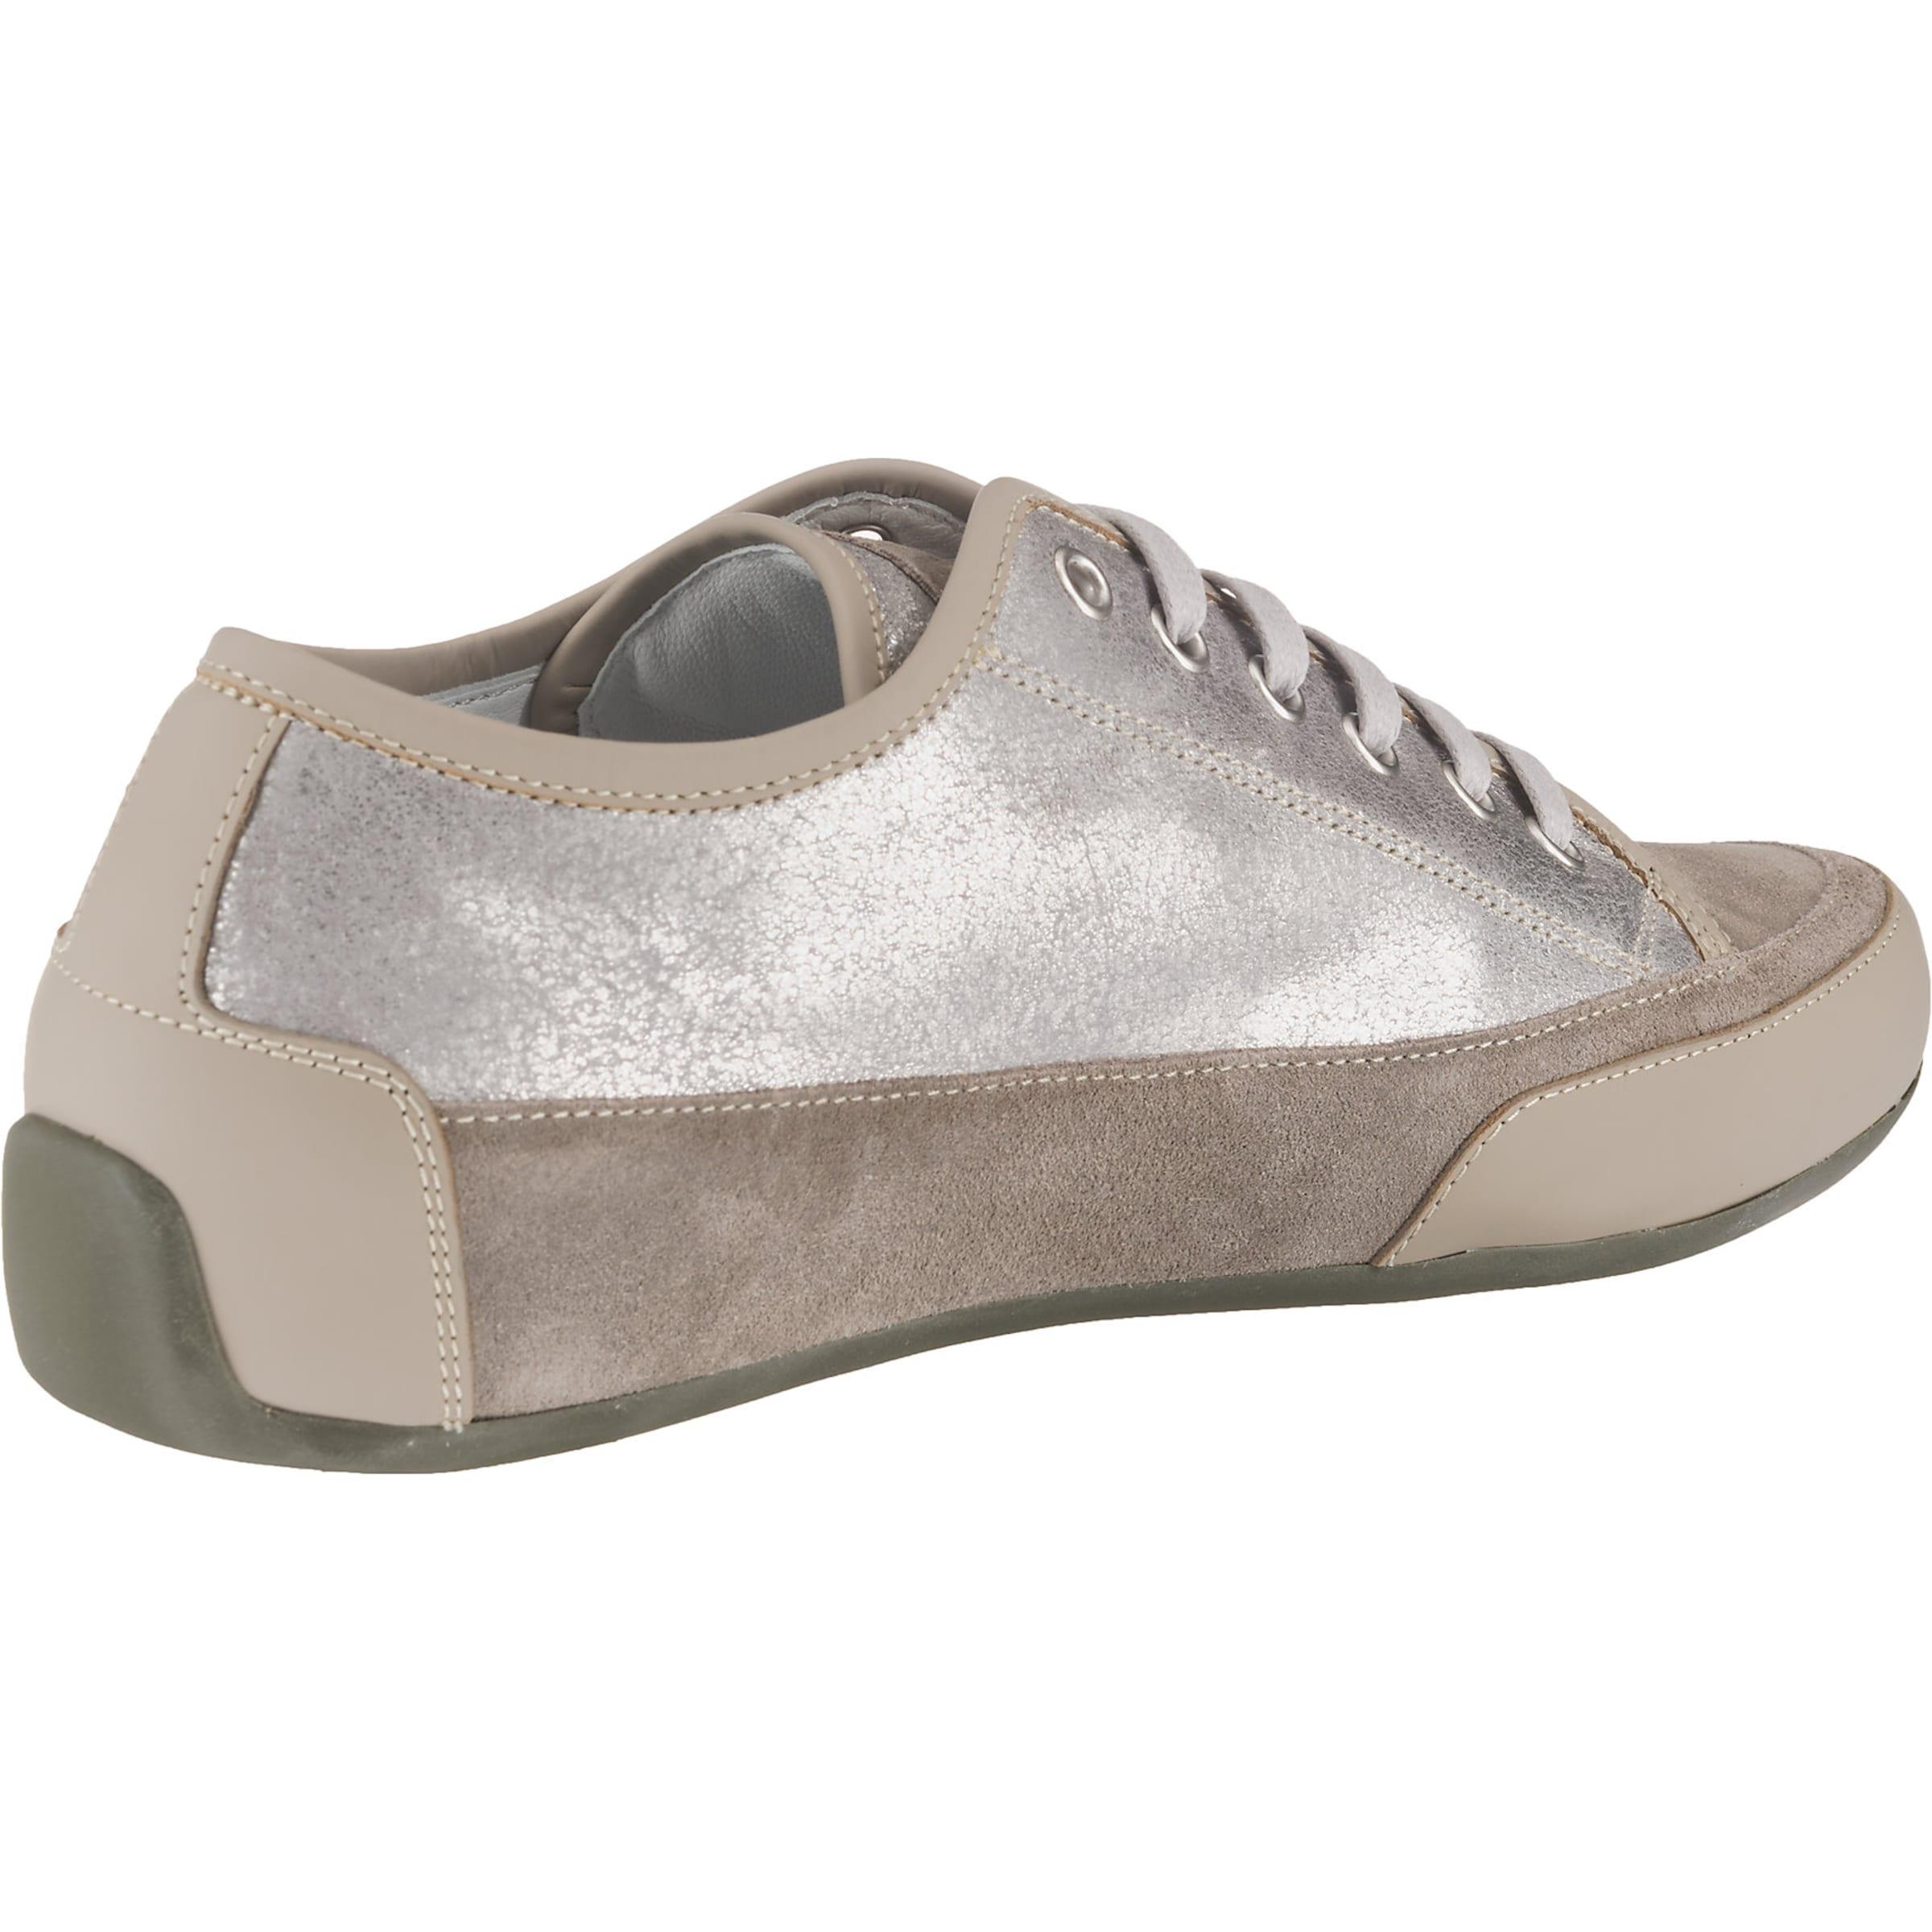 Low Silber Candice Sneakers In Cooper uTlcFK13J